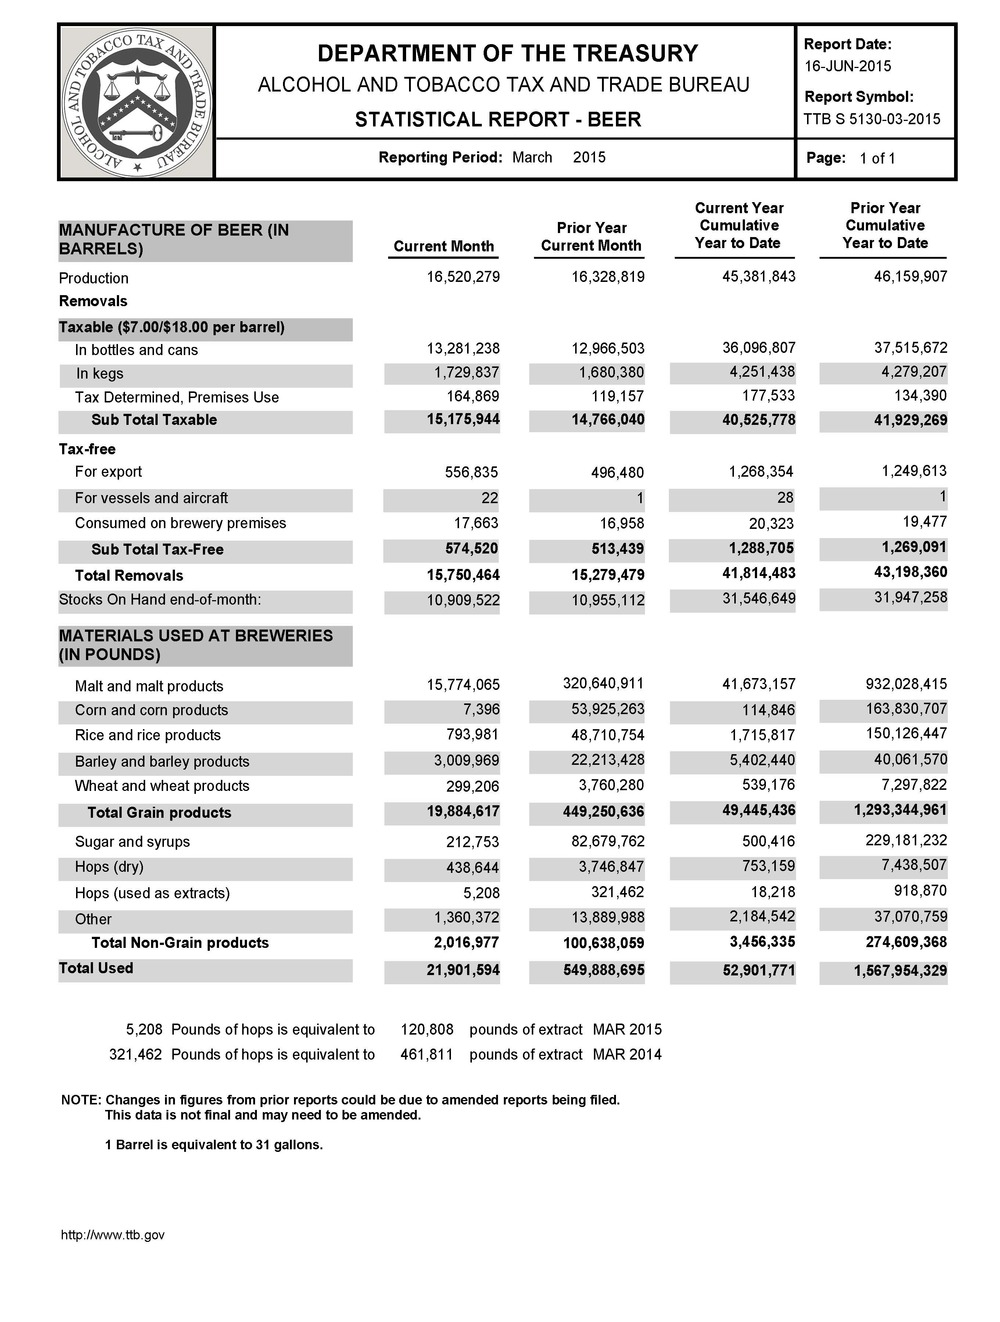 Source:   Alcohol Tobacco Tax and Trade Bureau